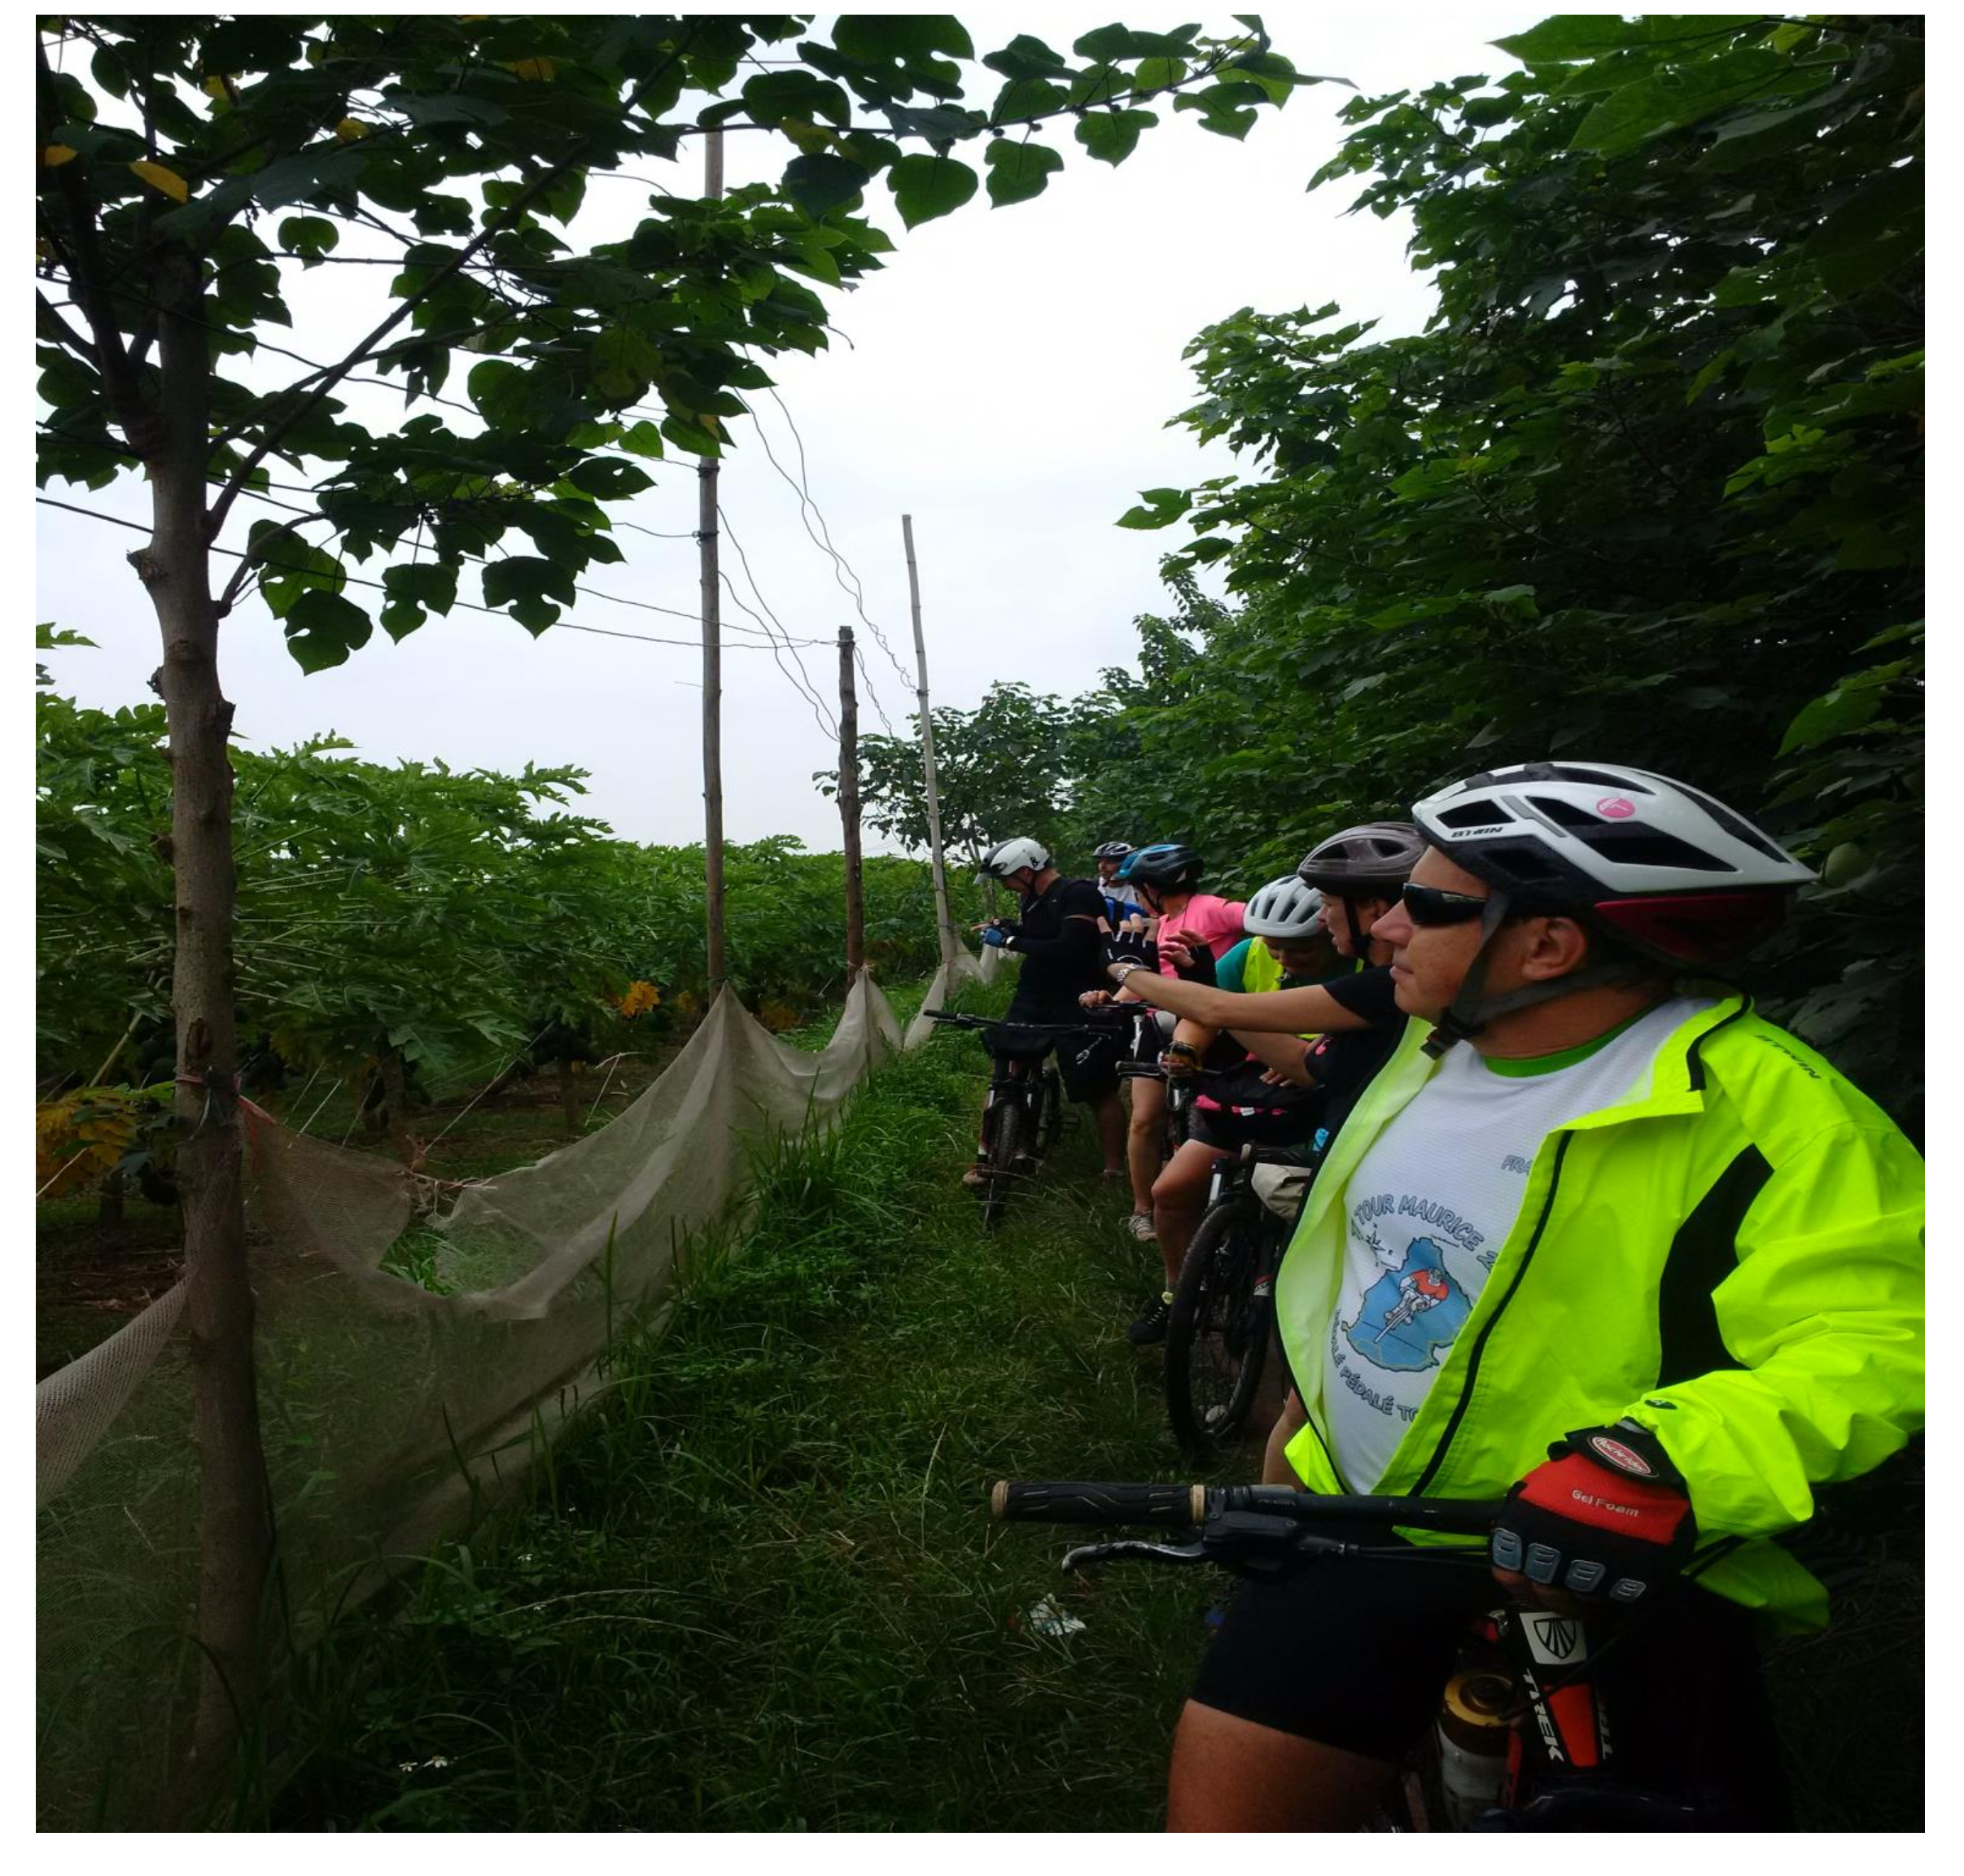 HANOI OFF THE BEATEN TRACK DUONG LAM FULL DAY CYCLING TRIP